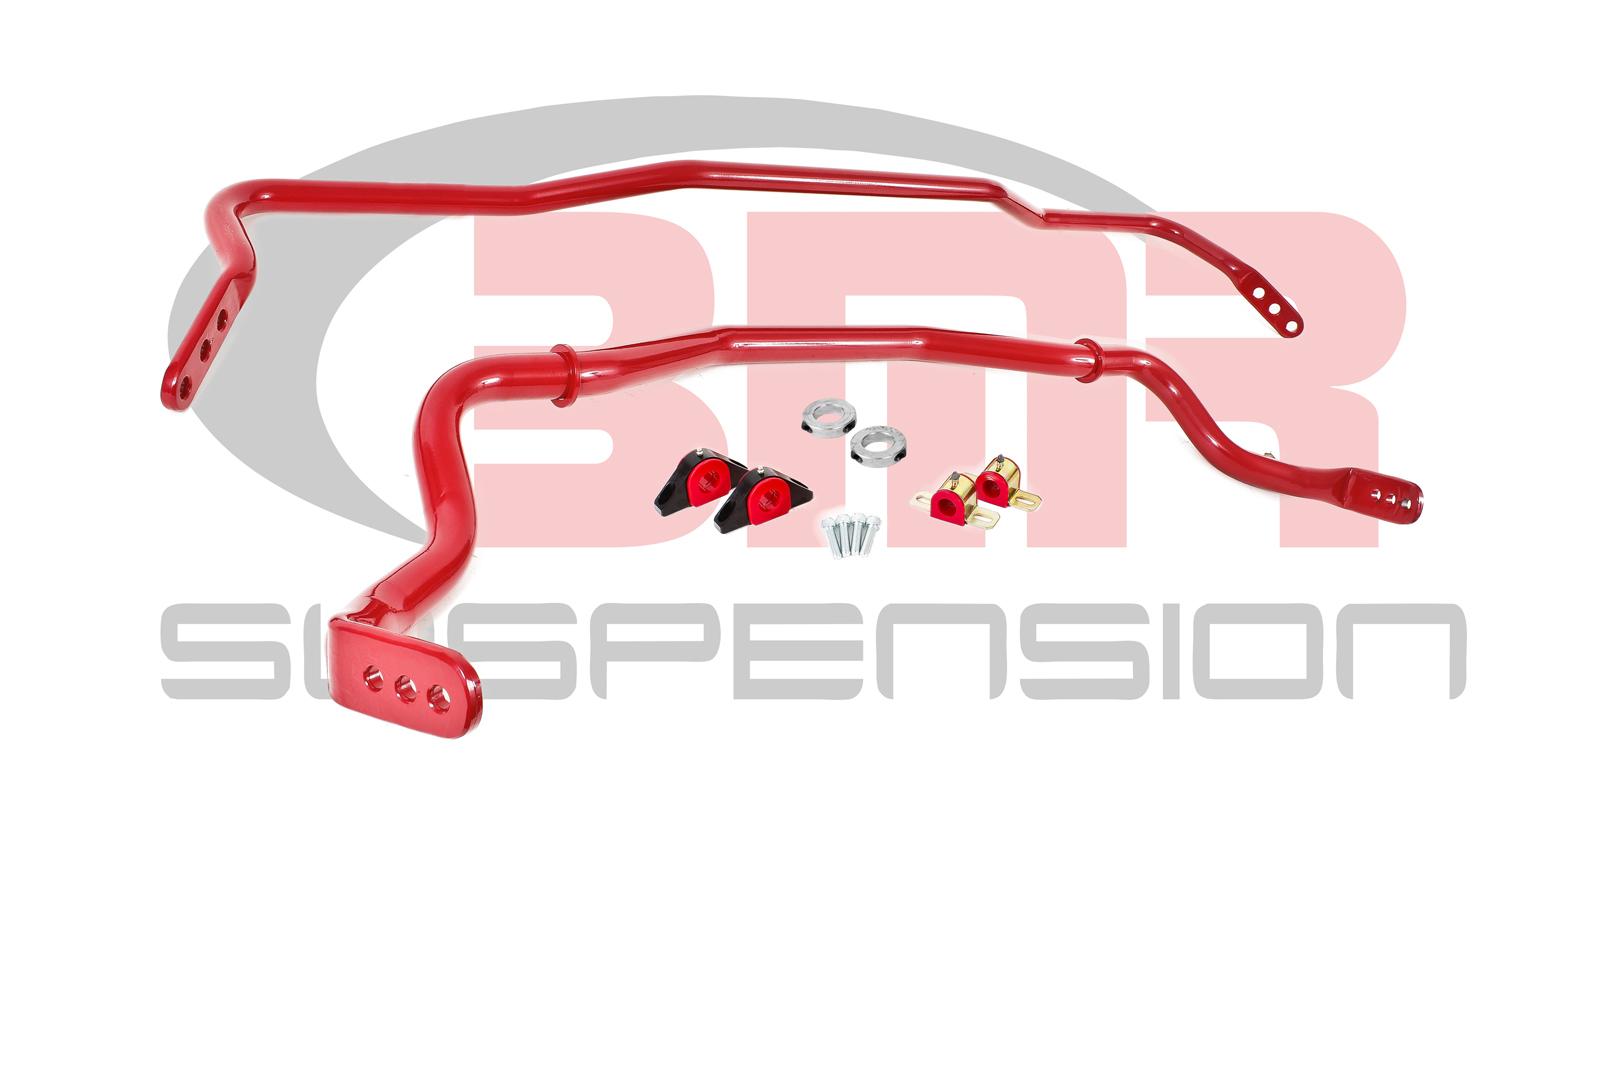 Bmr Suspension 15-20 Mustang Sway Bar Kit With Bushings